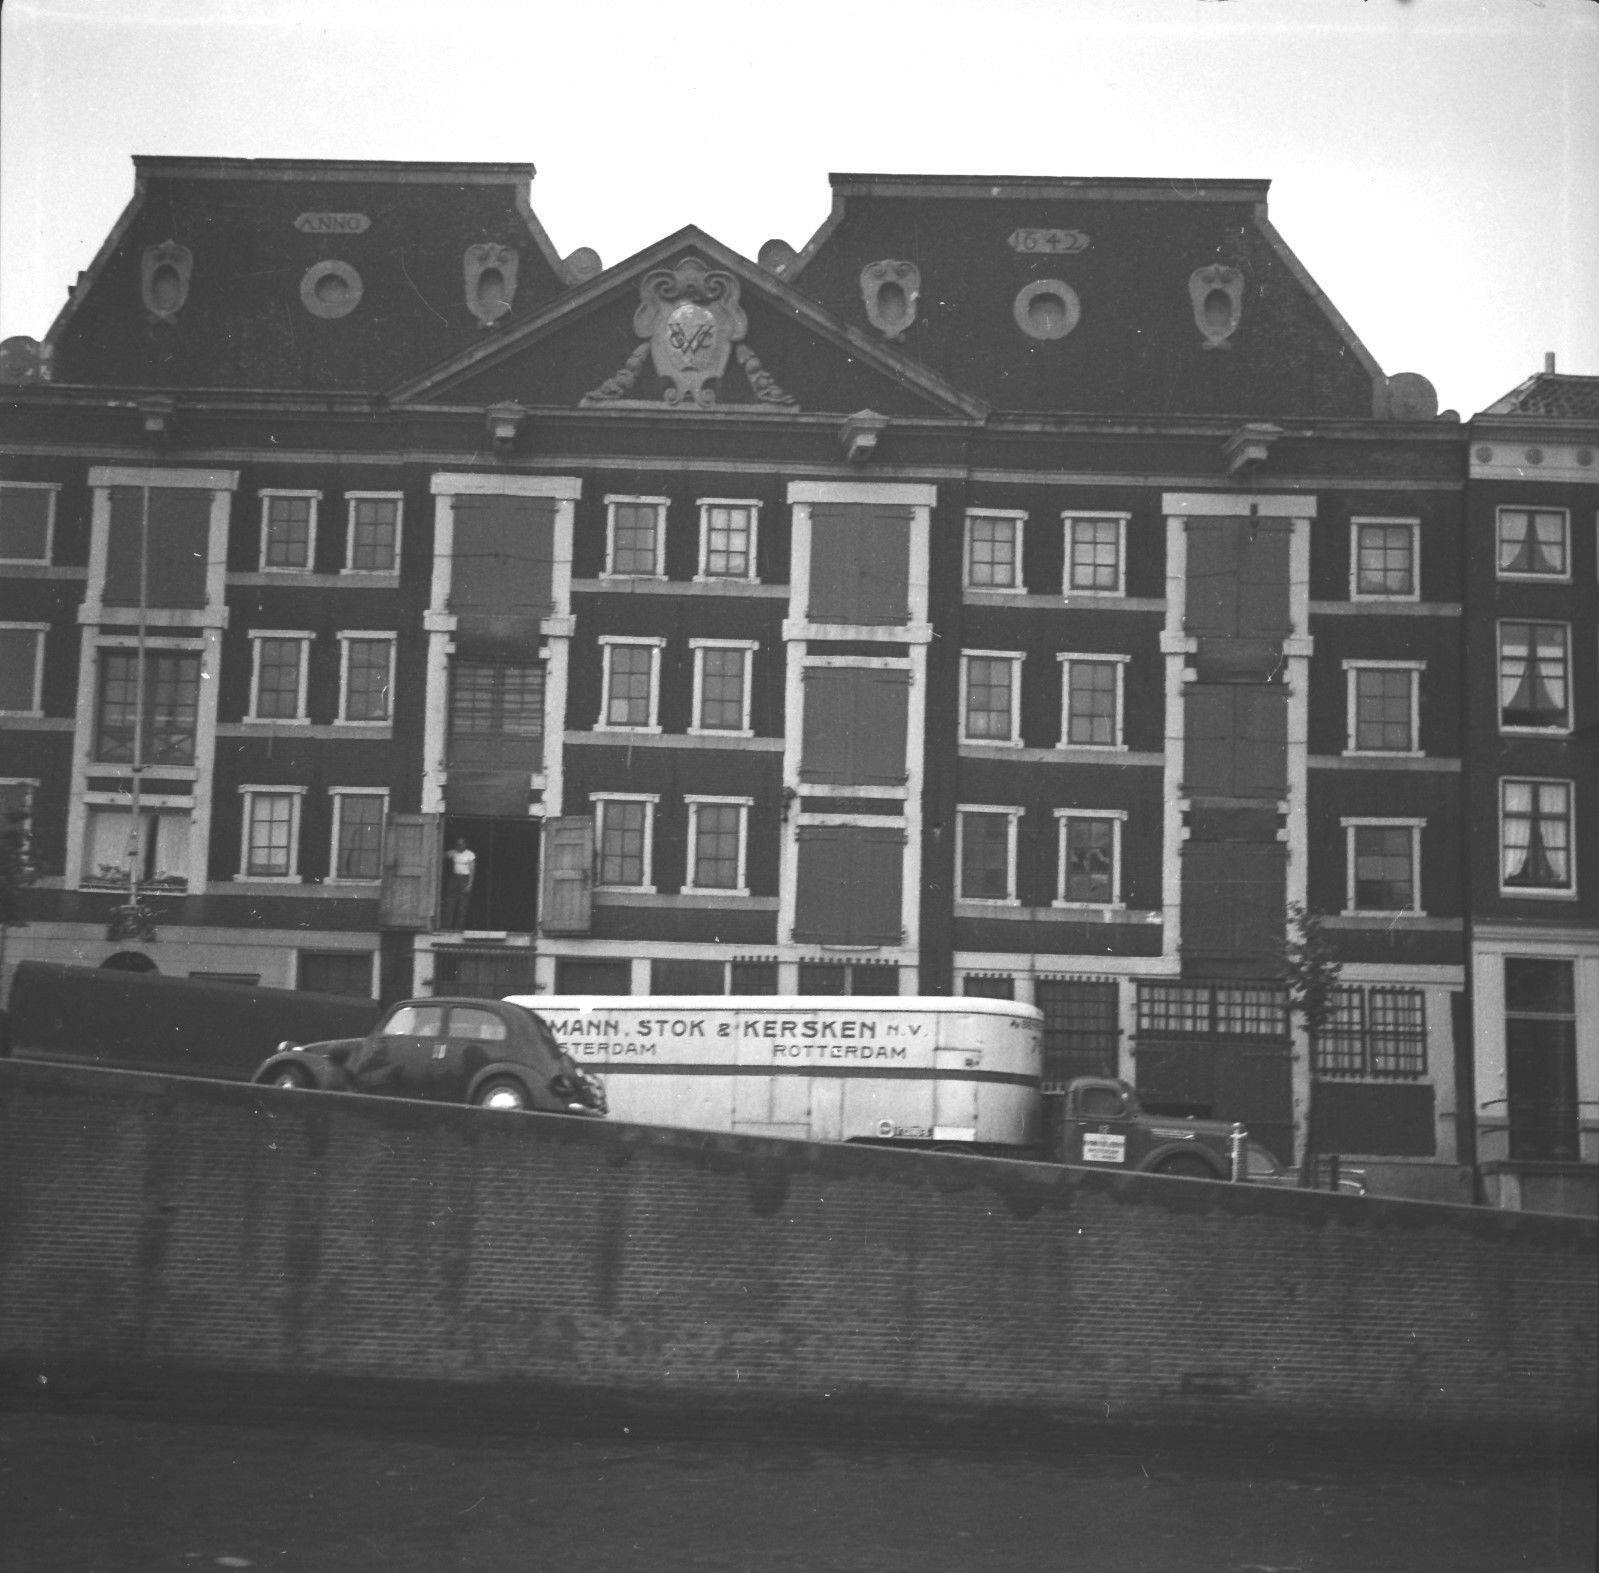 Mack-Amsterdam